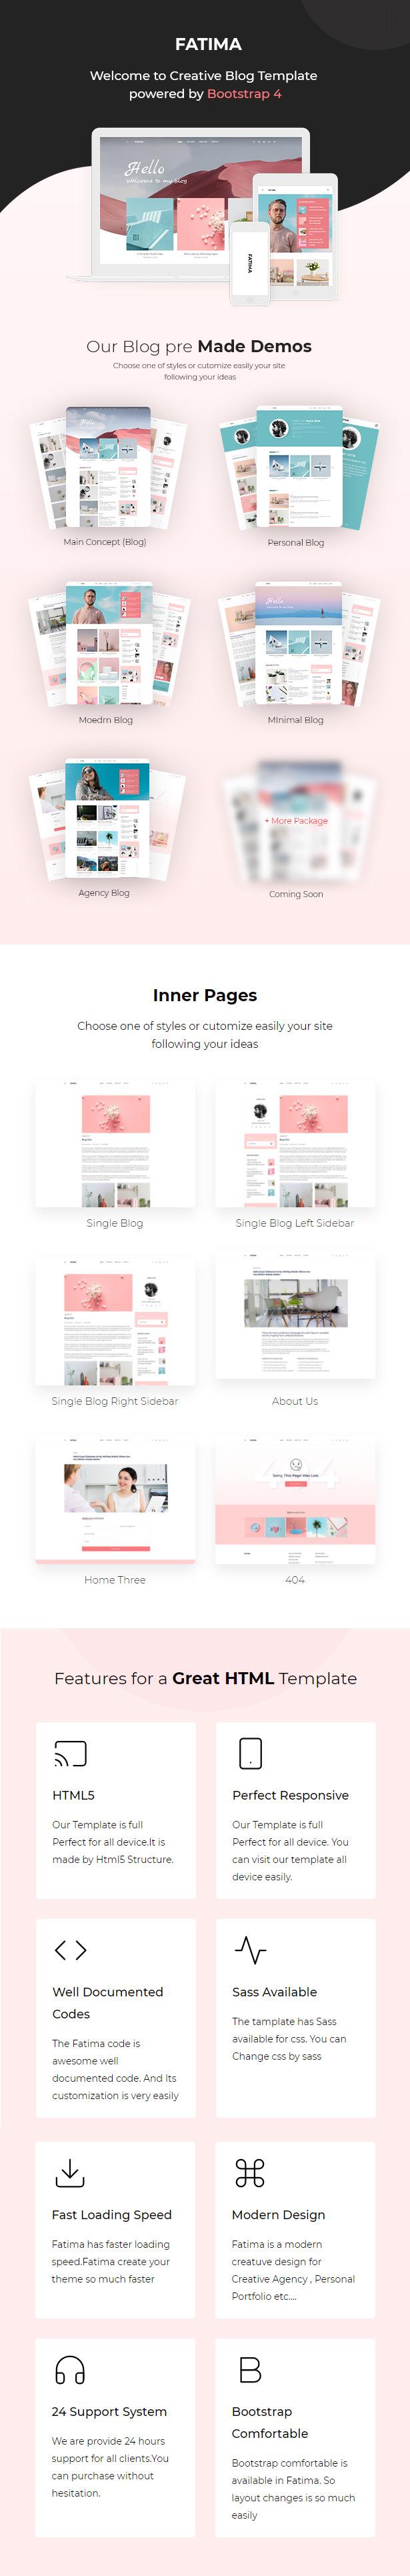 Fatima - Creative Personal Blog Bootstrap 4 Template - 1